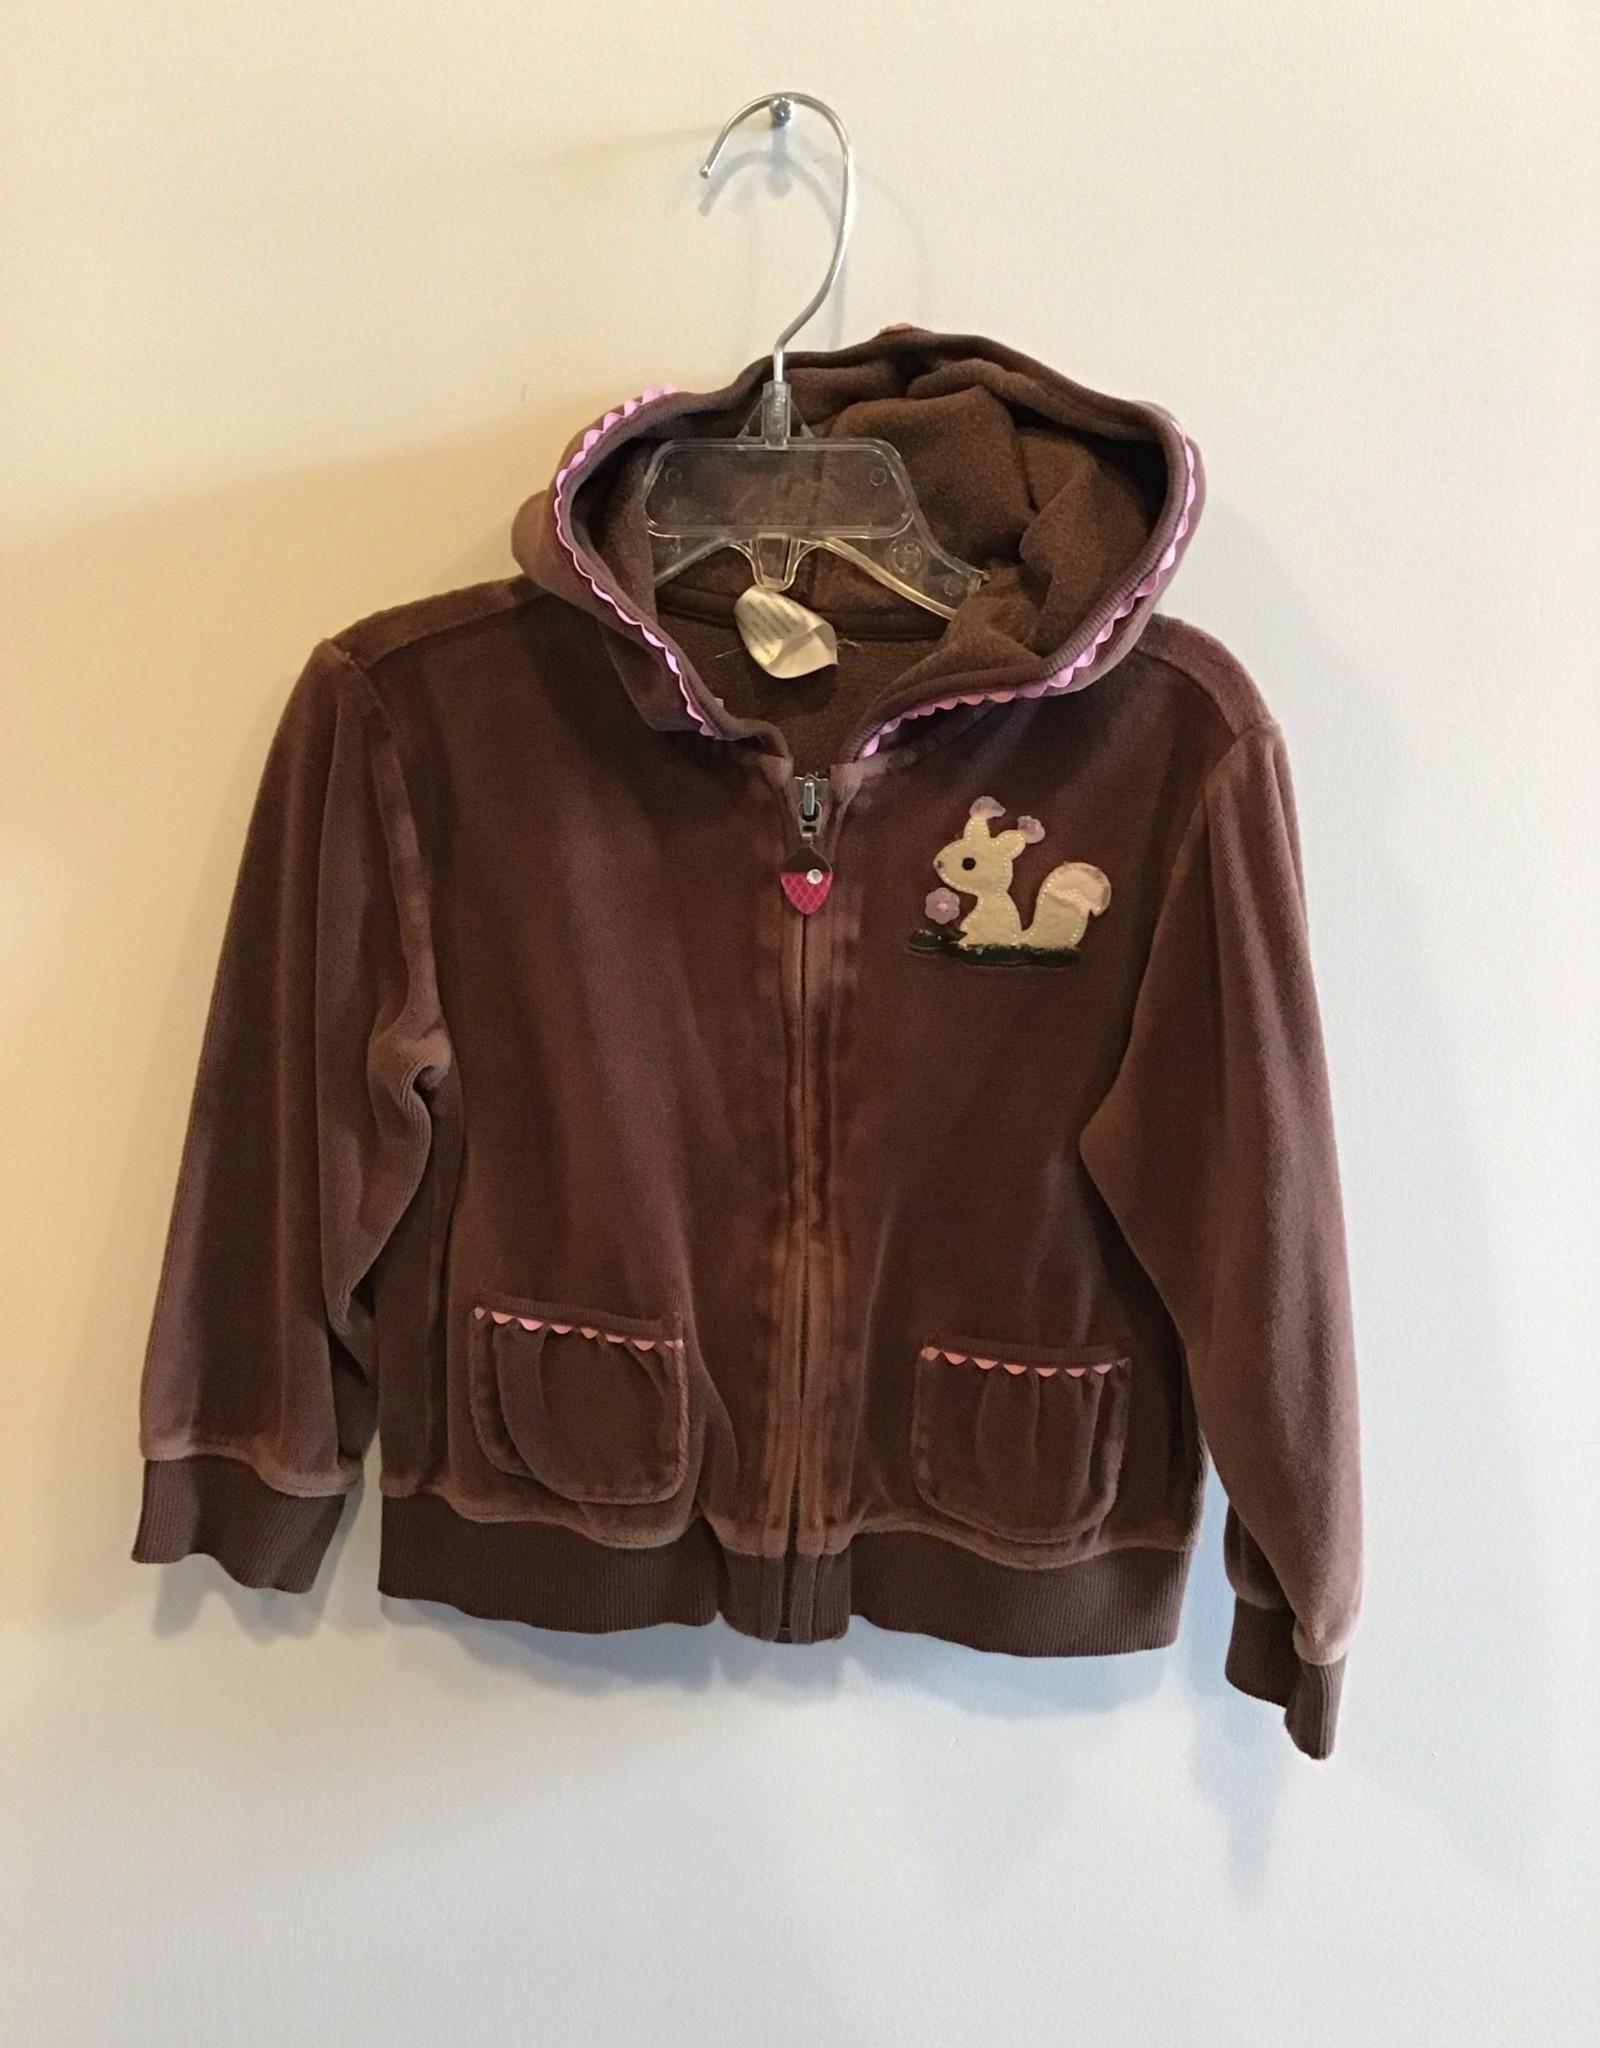 Gymboree Girls/3T/Gymboree/Sweater